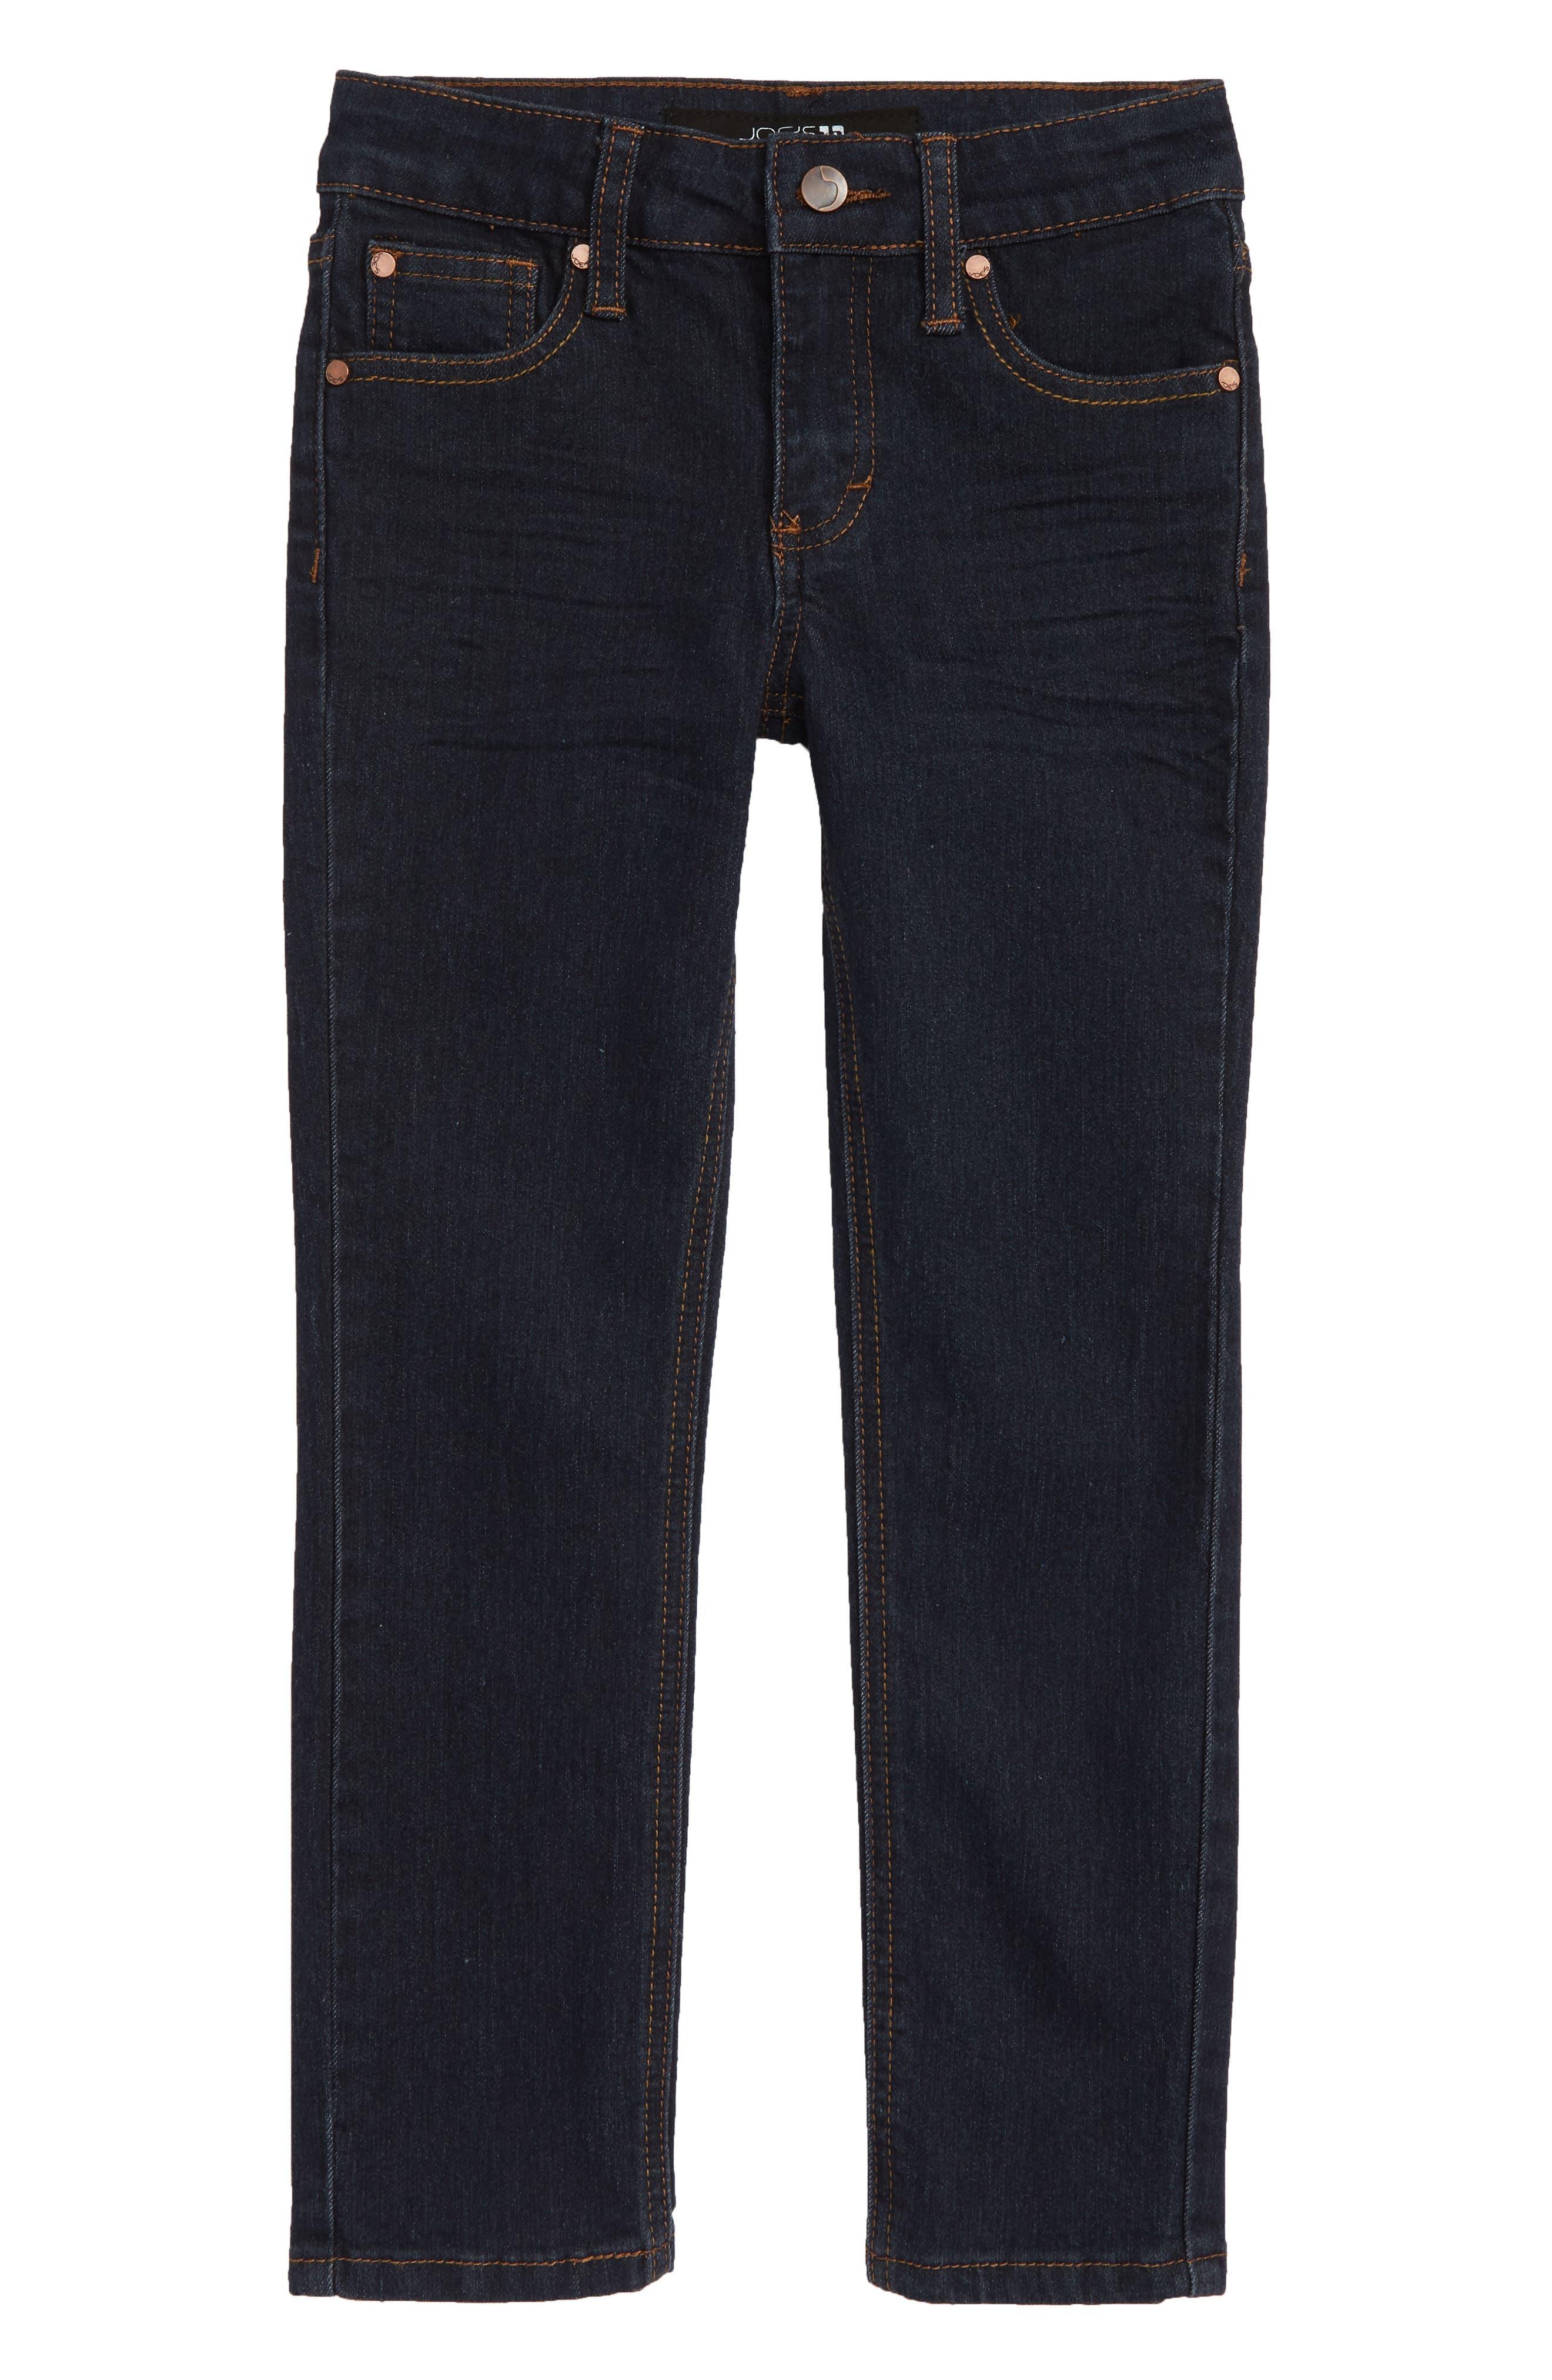 JOE'S, Brixton Stretch Jeans, Main thumbnail 1, color, RINSE